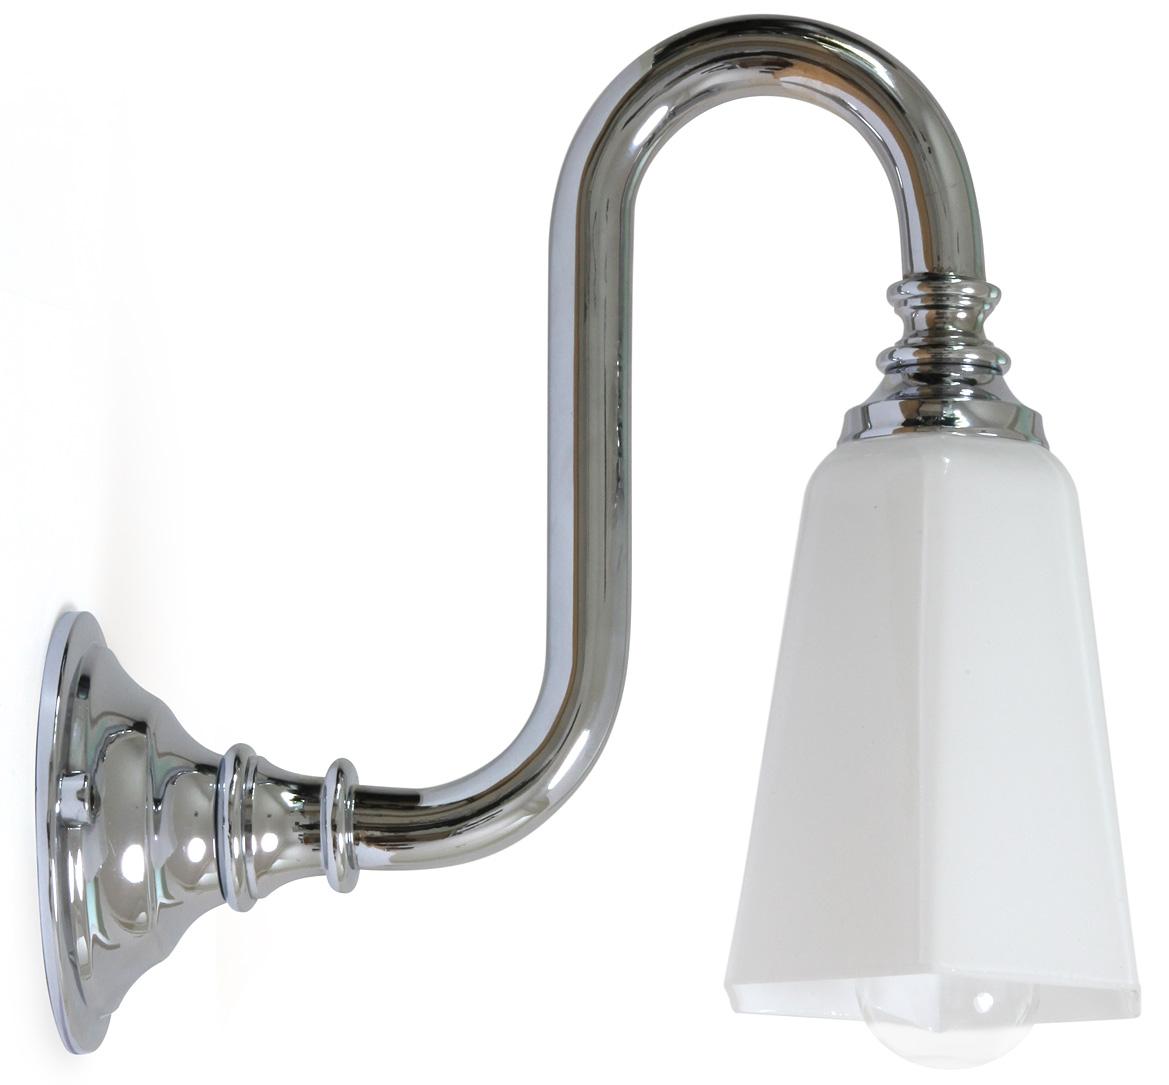 Wandlampe Badezimmer Led Licht F R Badezimmer Luxus Lampe Badezimmer Wand Garten Design